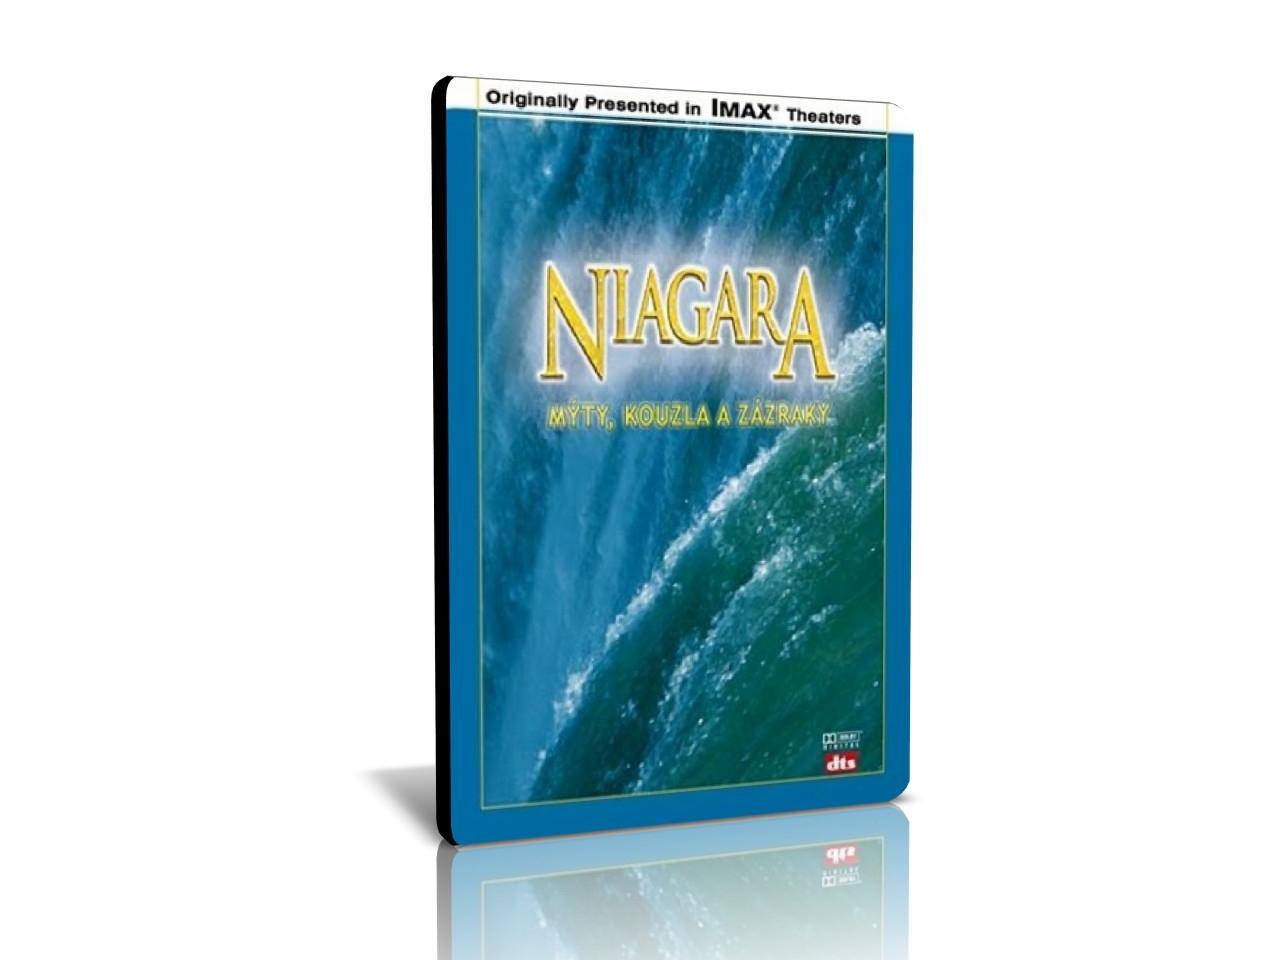 IMAX: Niagara (DVD)